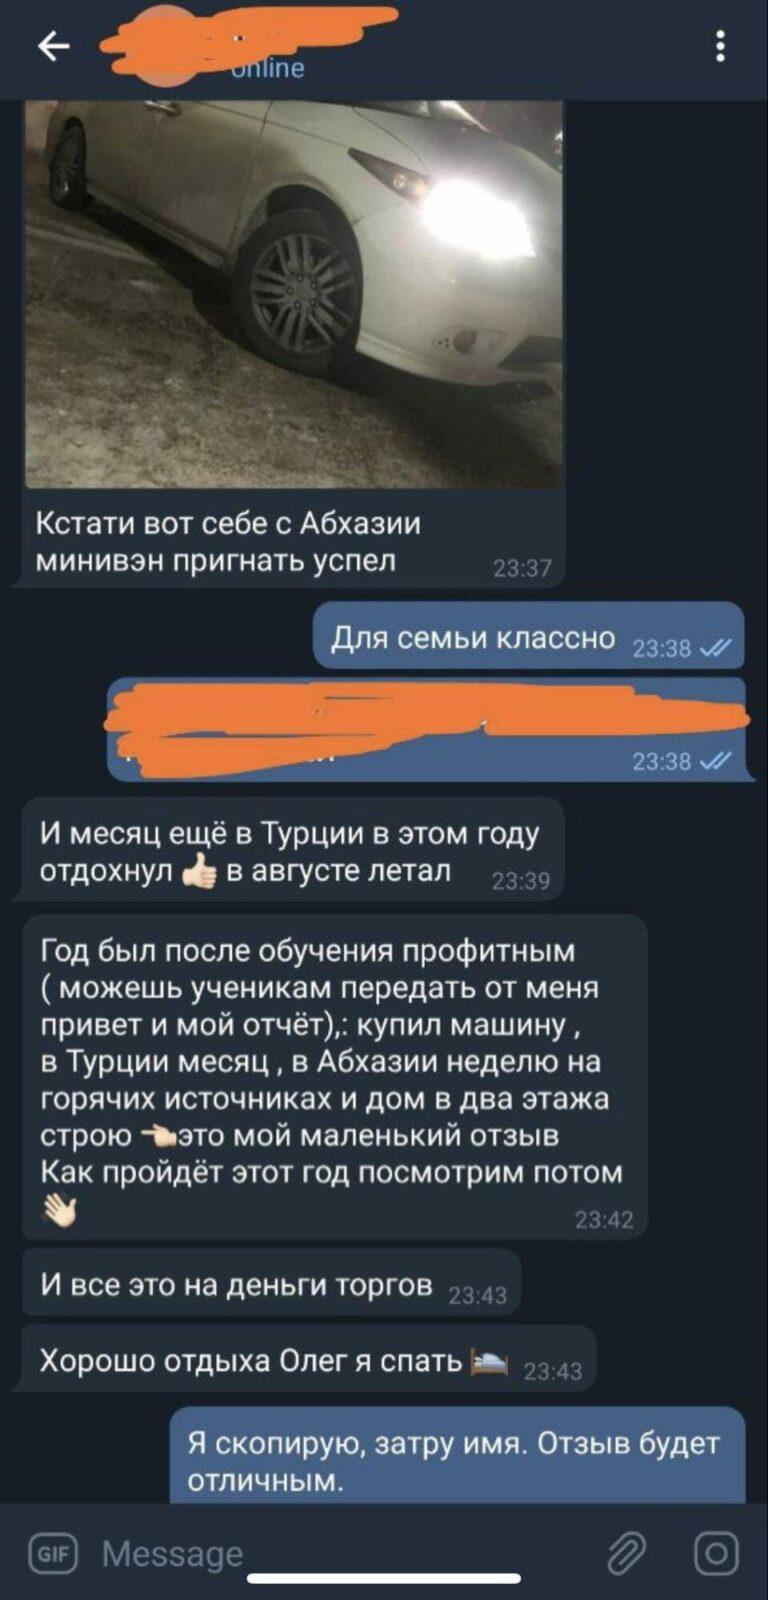 Олег Ганн отзывы